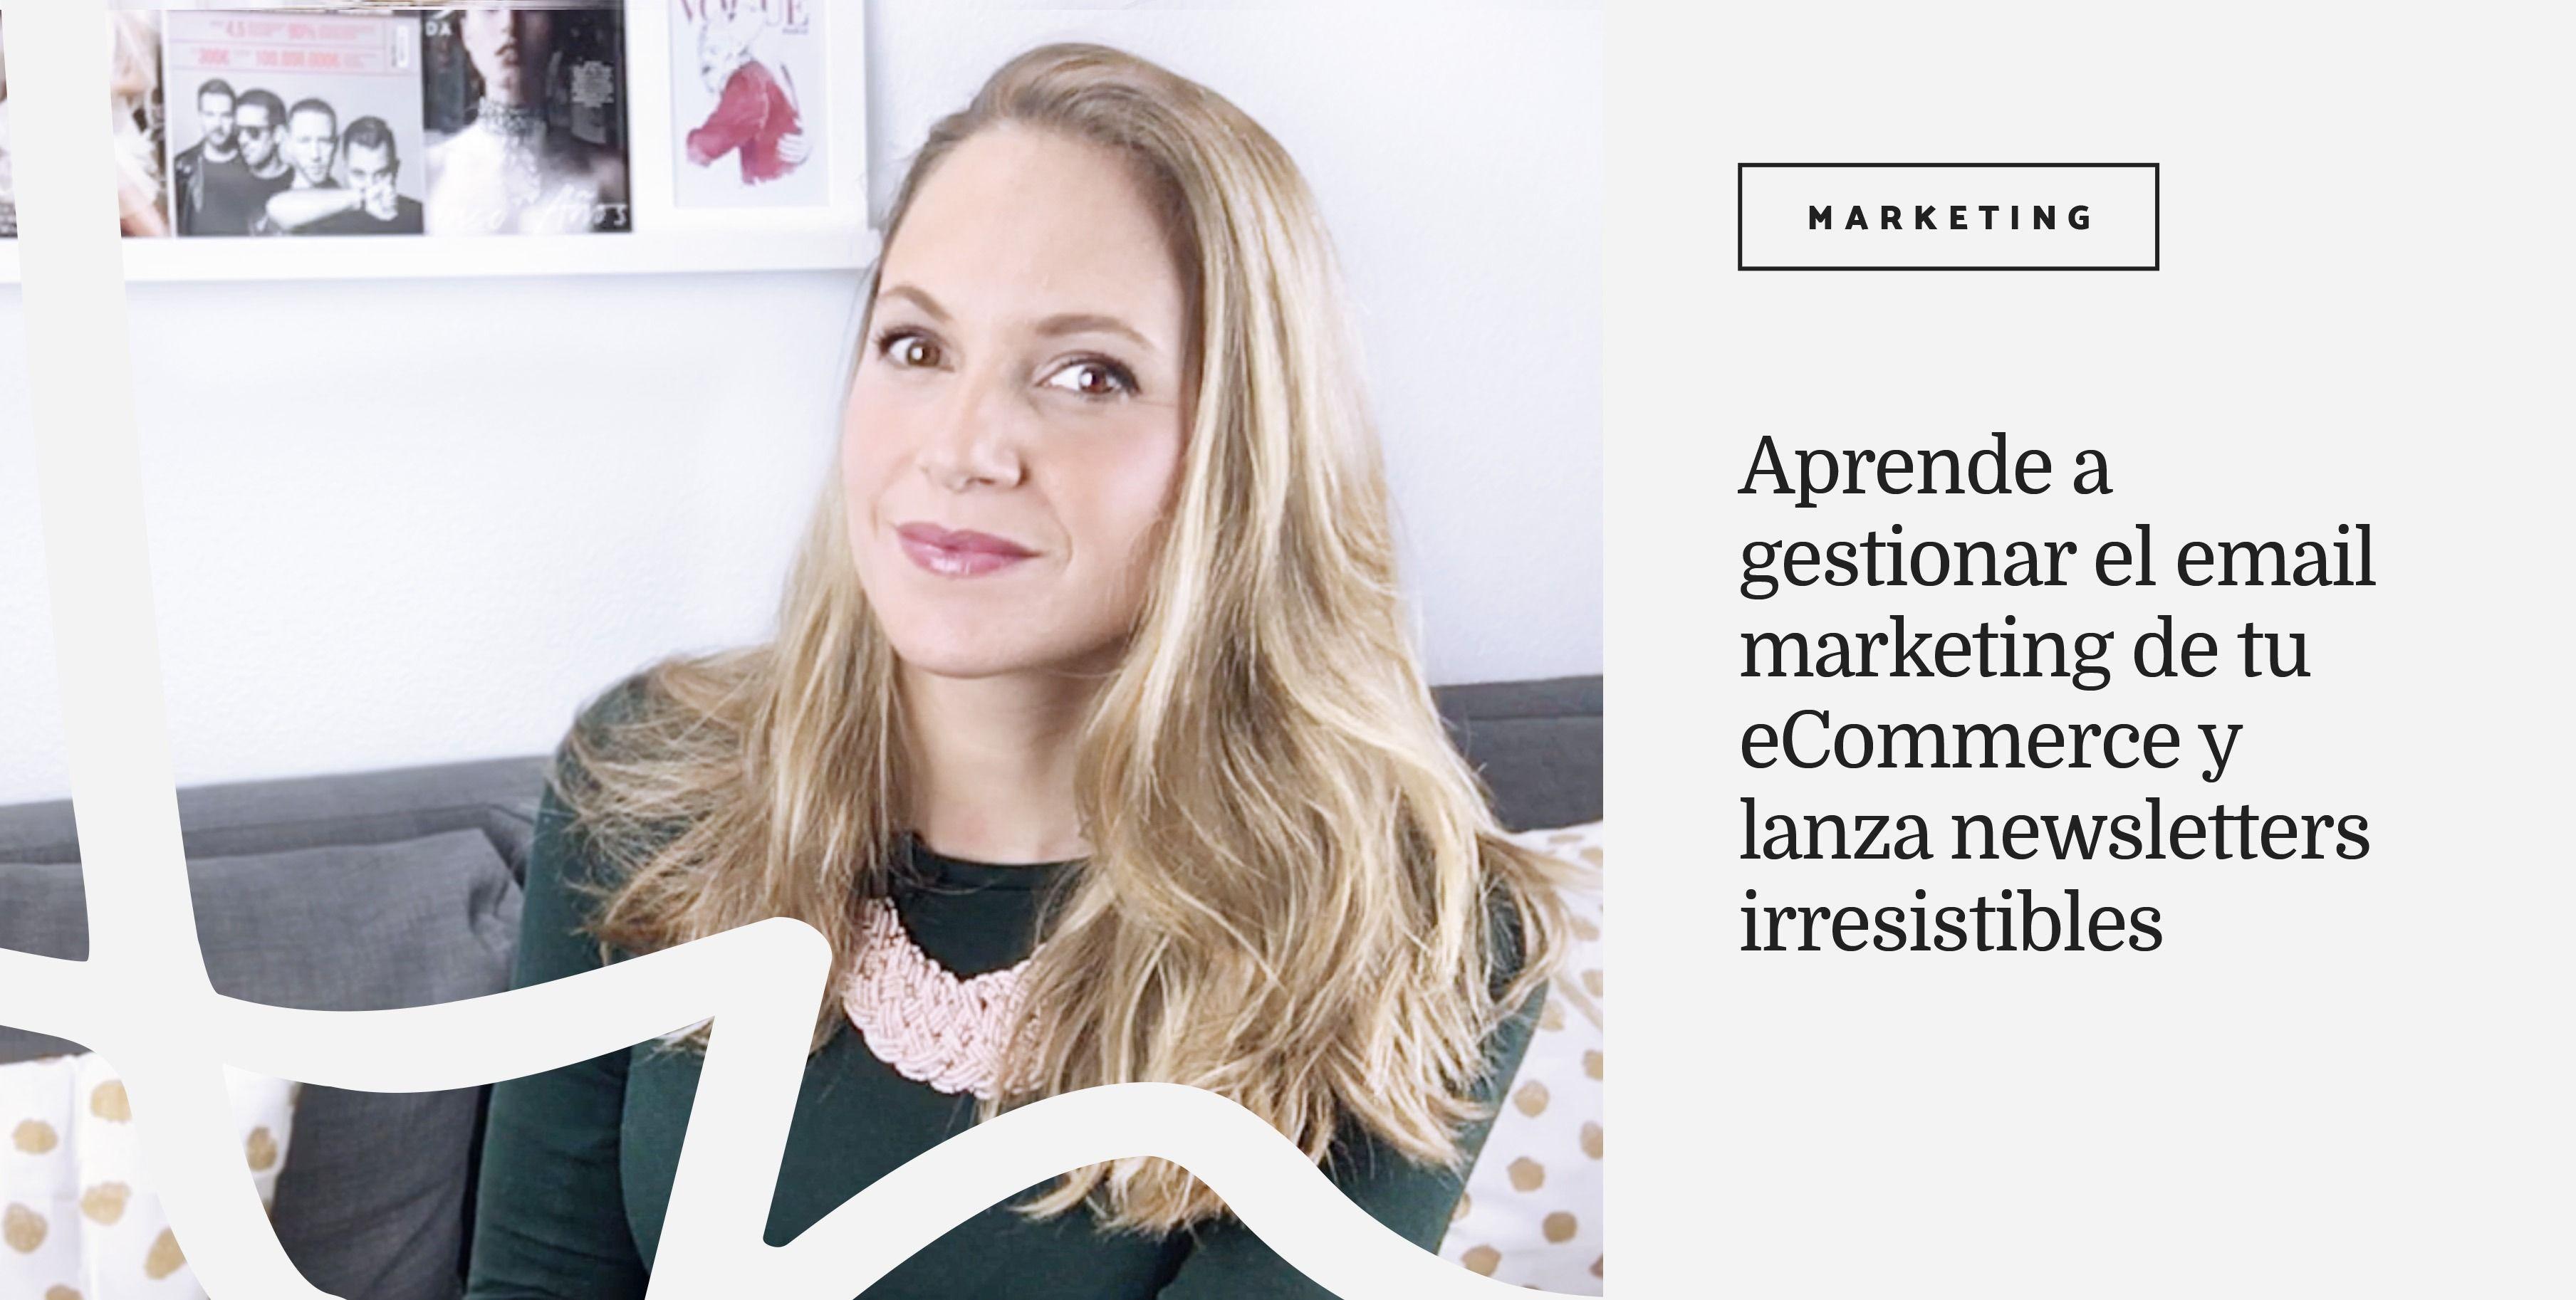 Ejemplos-newsletters-moda-Ana-Diaz-del-Rio-Portada.jpg